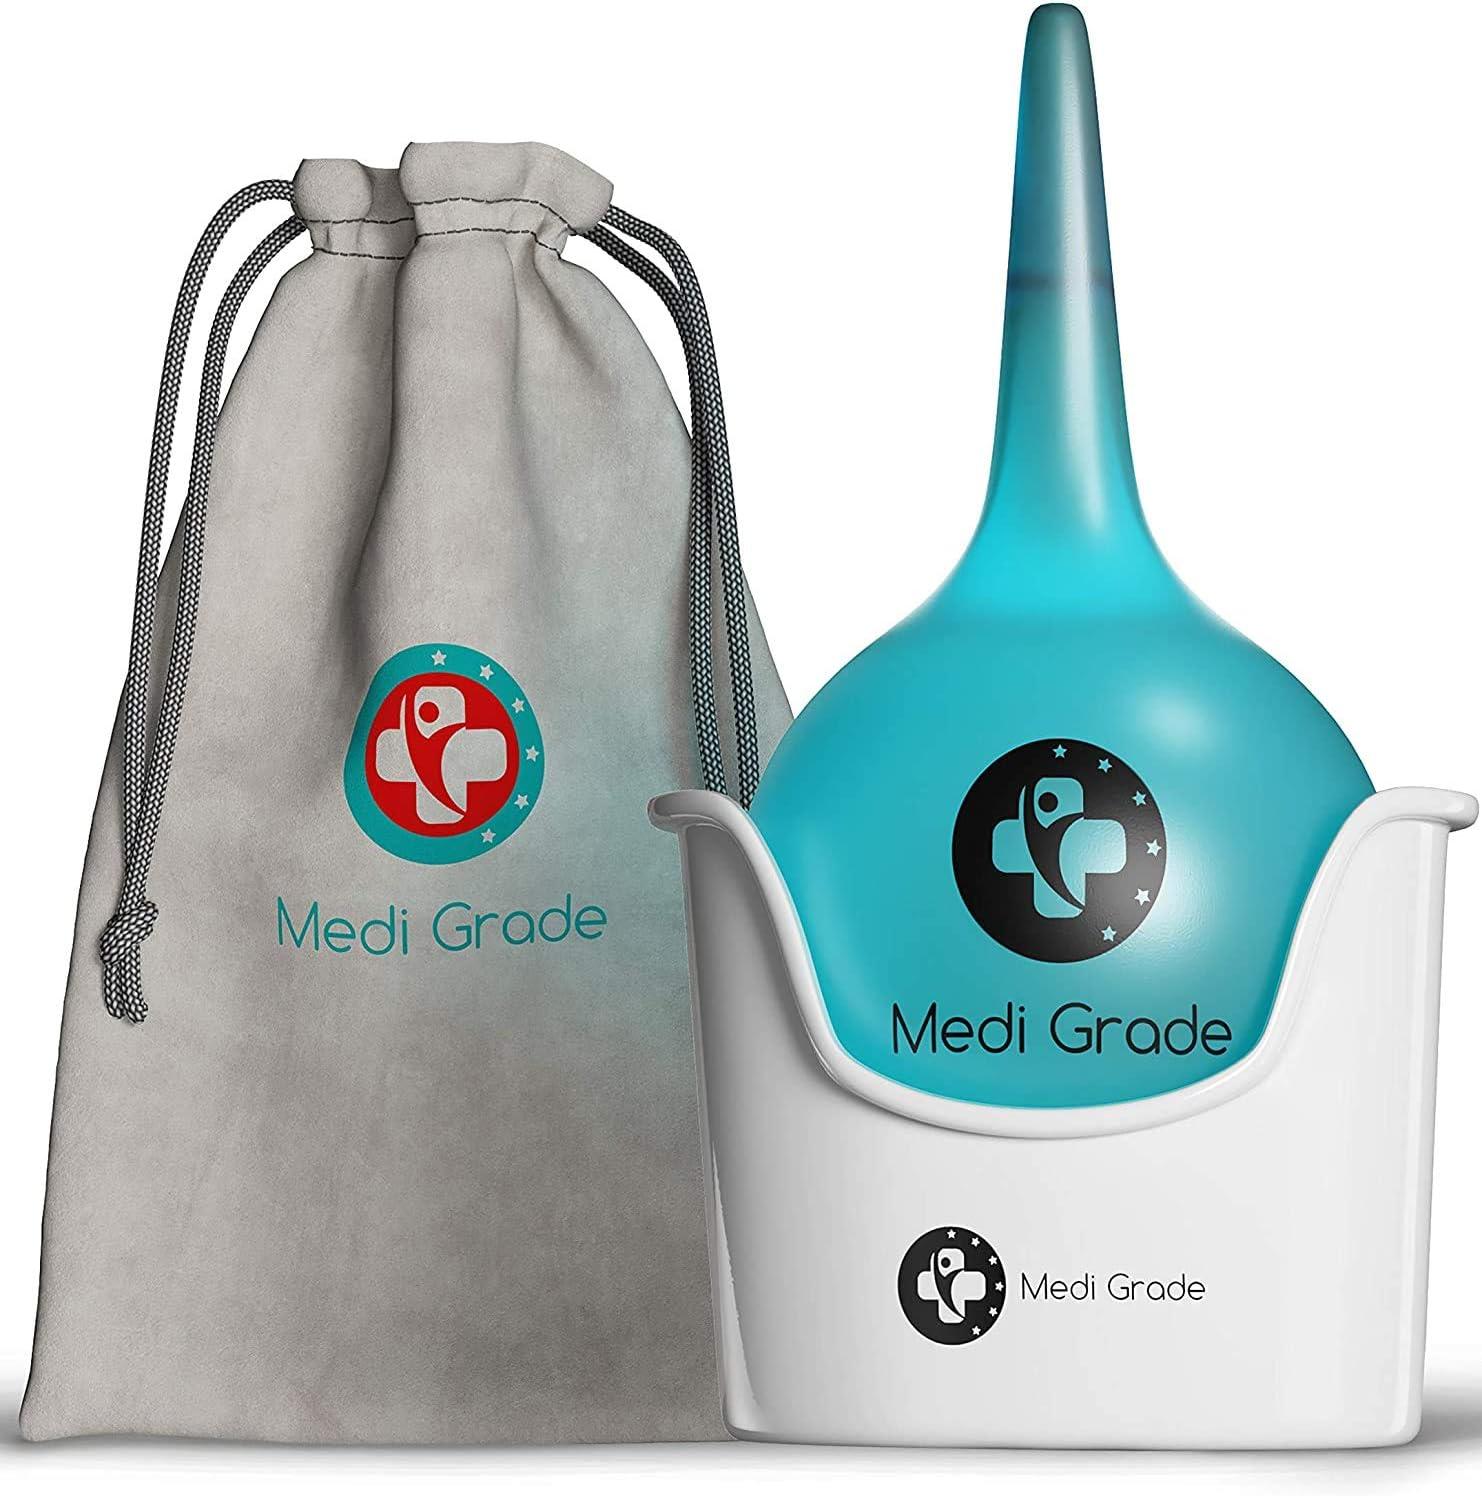 Kit de Limpieza de O/ídos de Gran Capacidad 200 ml Set para Limpiar O/ídos con Cubeta Incluida de Medi Grade Bulbo de Jeringa Grande para Eliminar Tapones de O/ídos